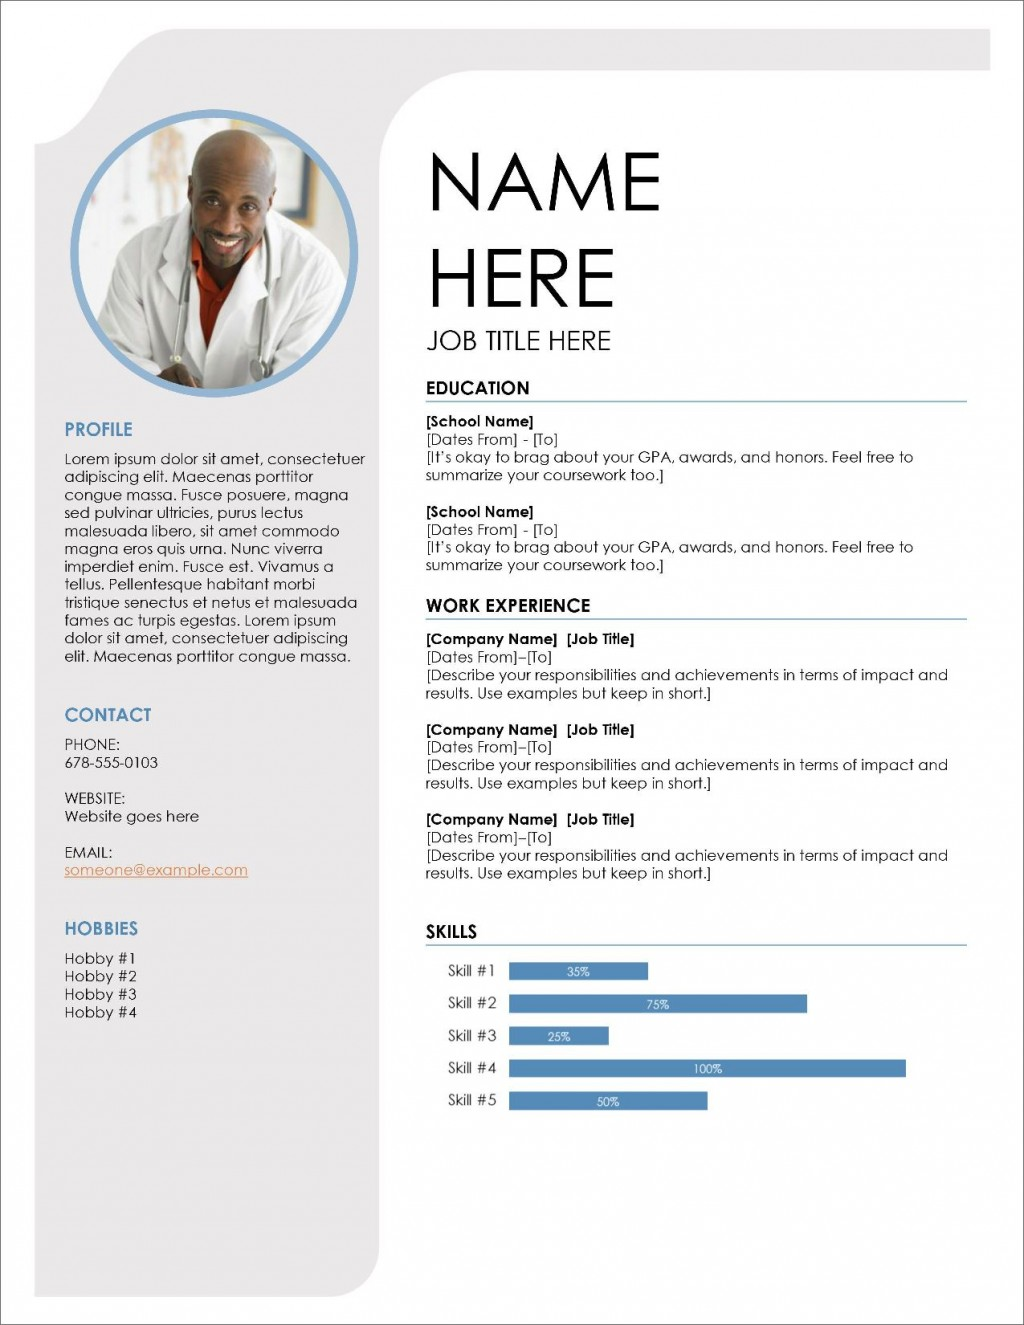 005 Rare Resume Template On Word Design  Free Download Australia Microsoft Office 2007 PhilippineLarge